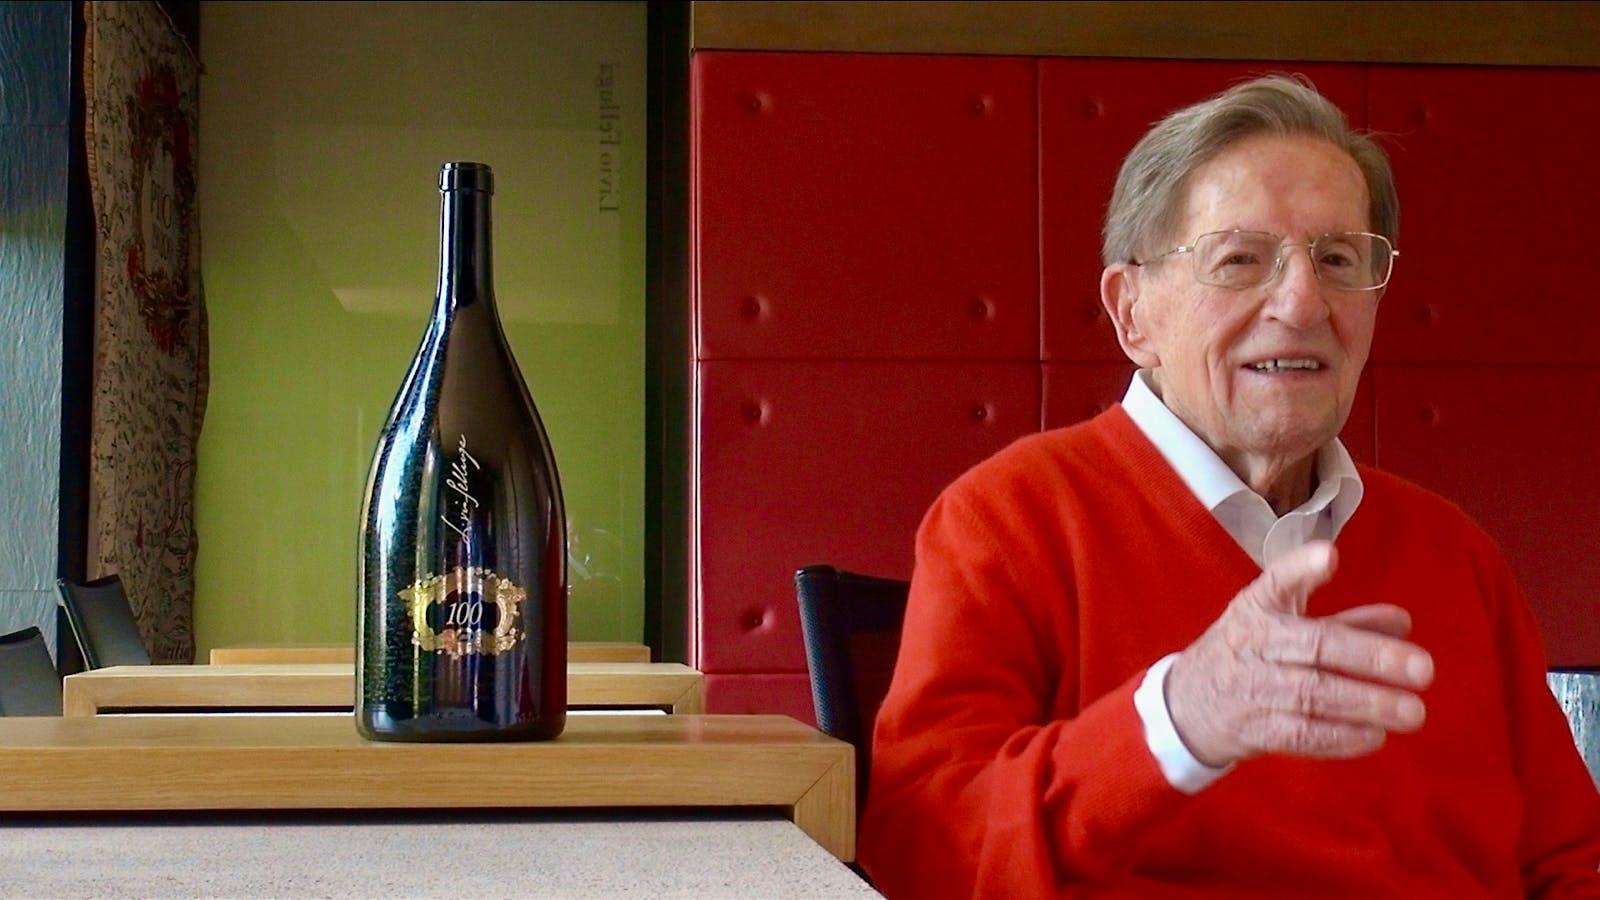 Italian Winemaking Pioneer Livio Felluga Dies at 102